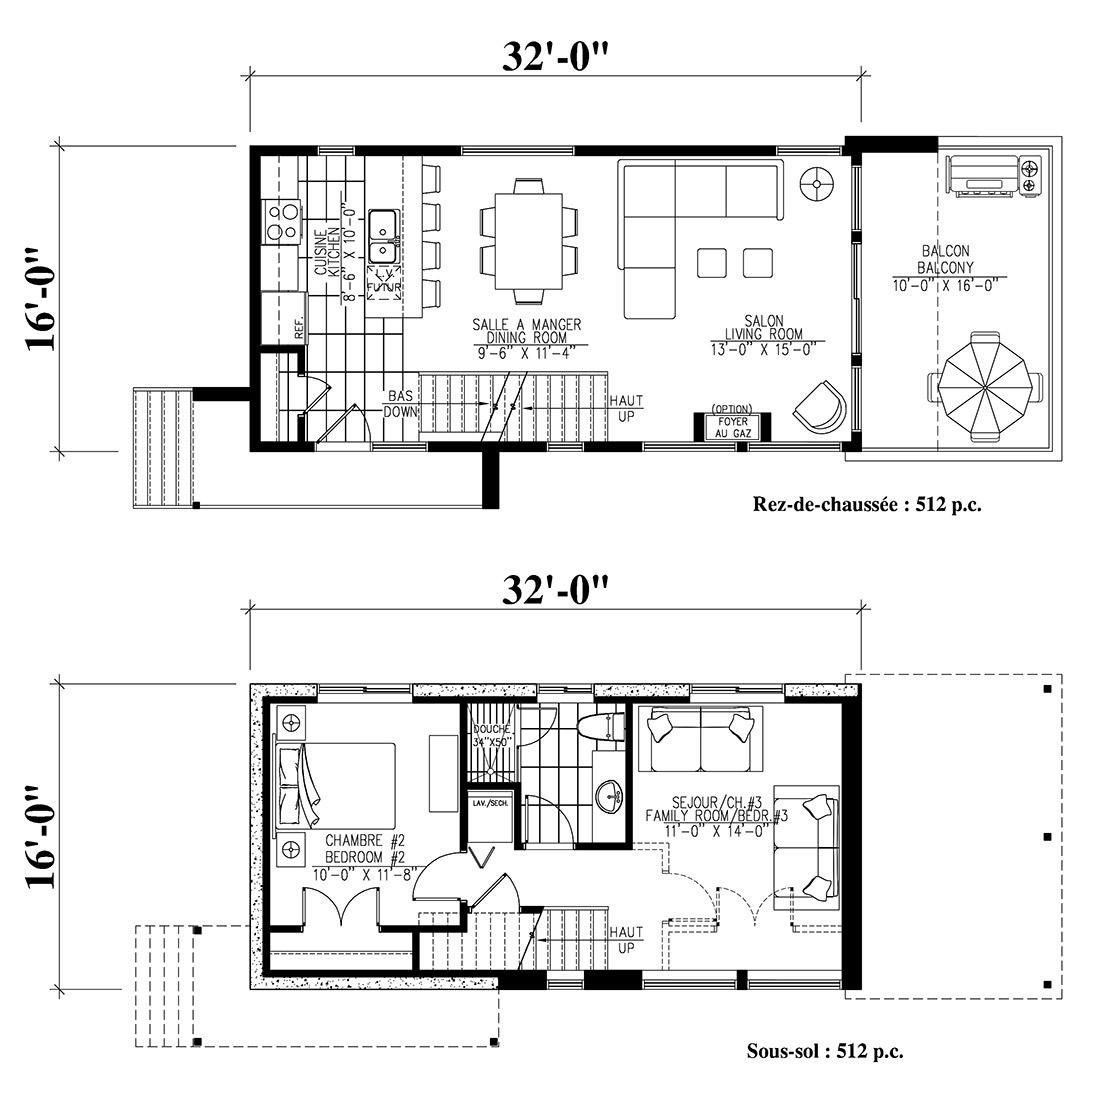 817-plan-ss-rdc_realisation-amico